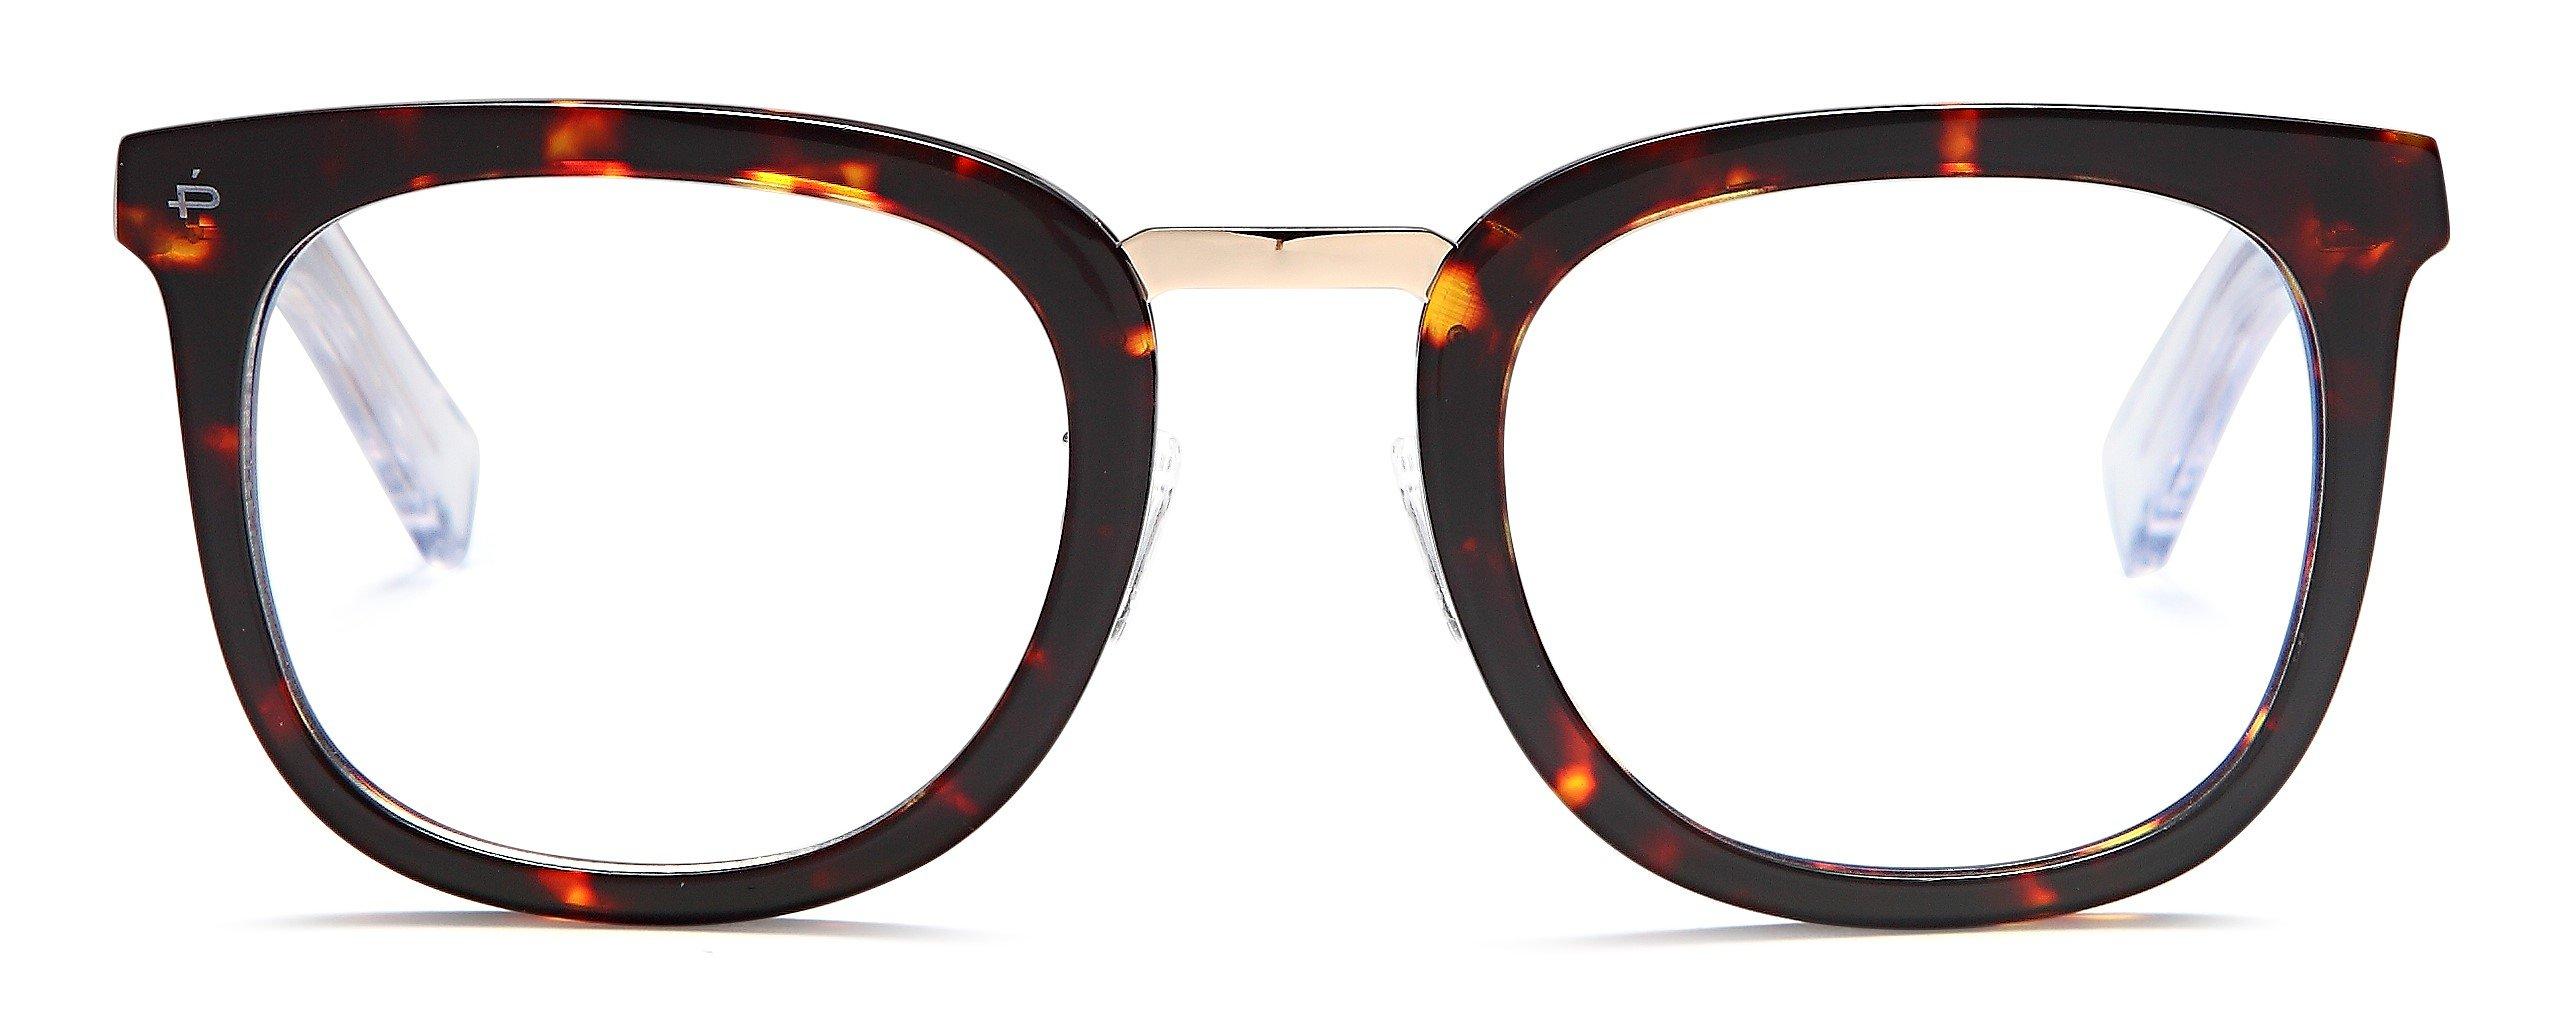 "PRIVÉ REVAUX ""The Alchemist"" Handcrafted Designer Eyeglasses With Anti Blue-Light Blocking Lenses"